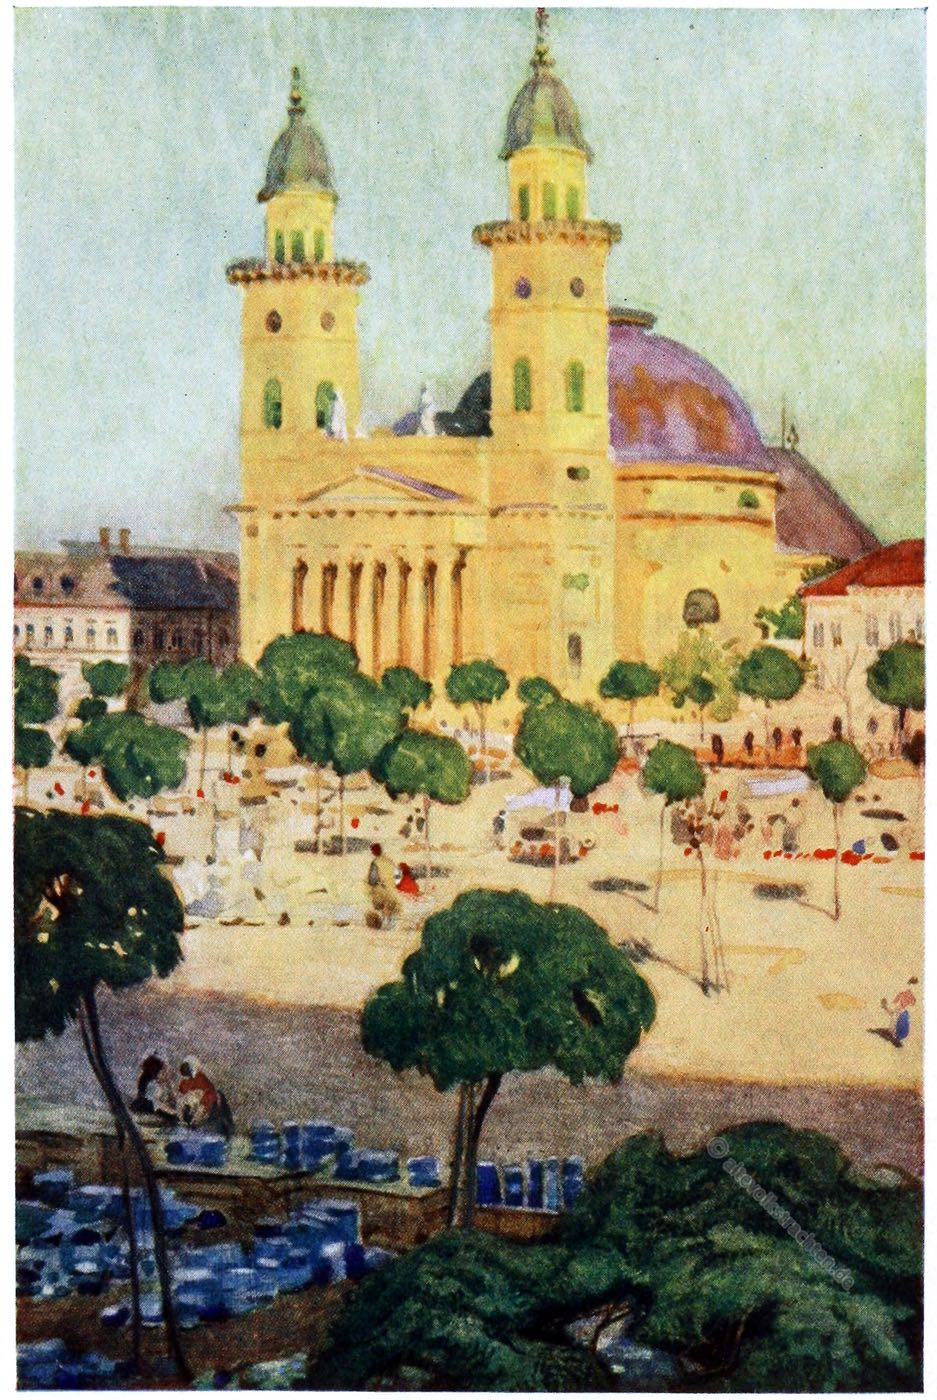 Adrian Scott Stokes, Szatmar, Satu Mare, Rumänien, Cathedral, Kathedrale